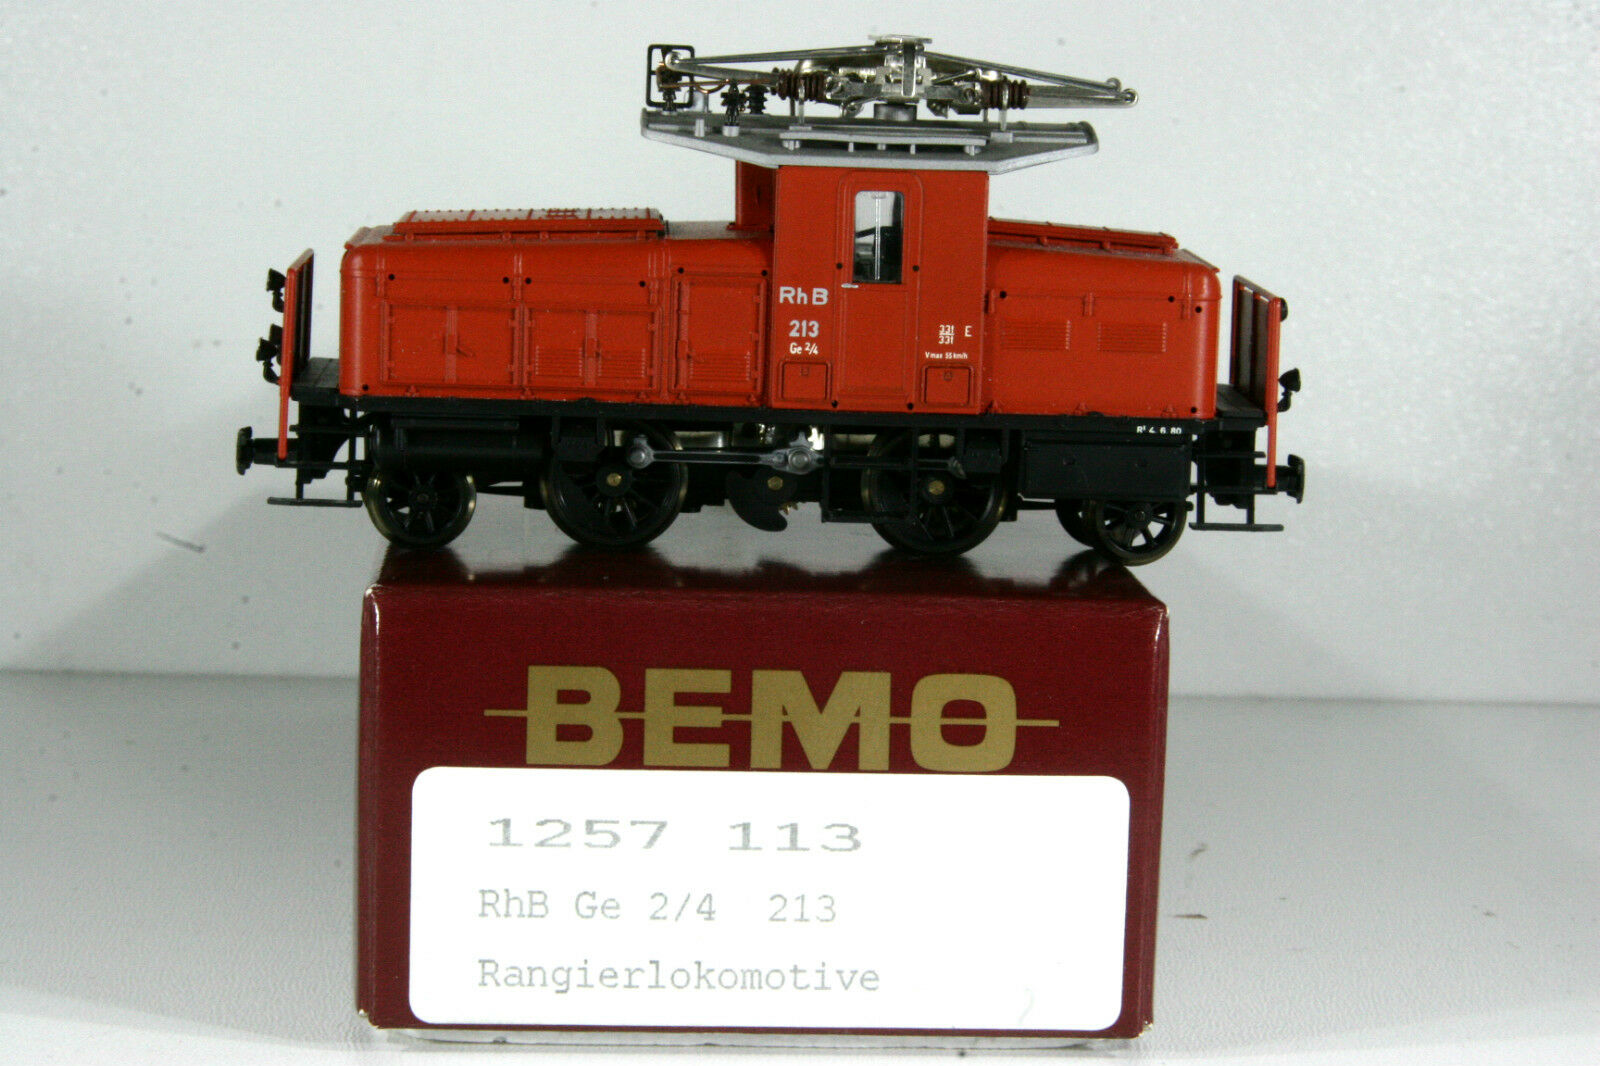 BEMO 1257 113 locomotiva, e-Lok, RHB Ge 2/4 213, traccia h0m, 12mm, TOP, OVP